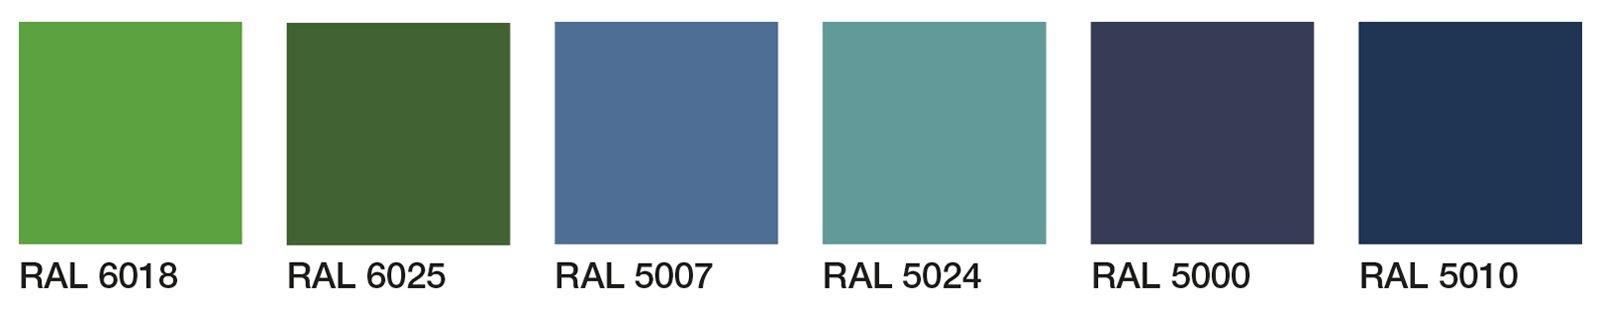 A ispirazioni Muro lampadari : Parete verde in soggiorno, blu in camera Cose di Casa